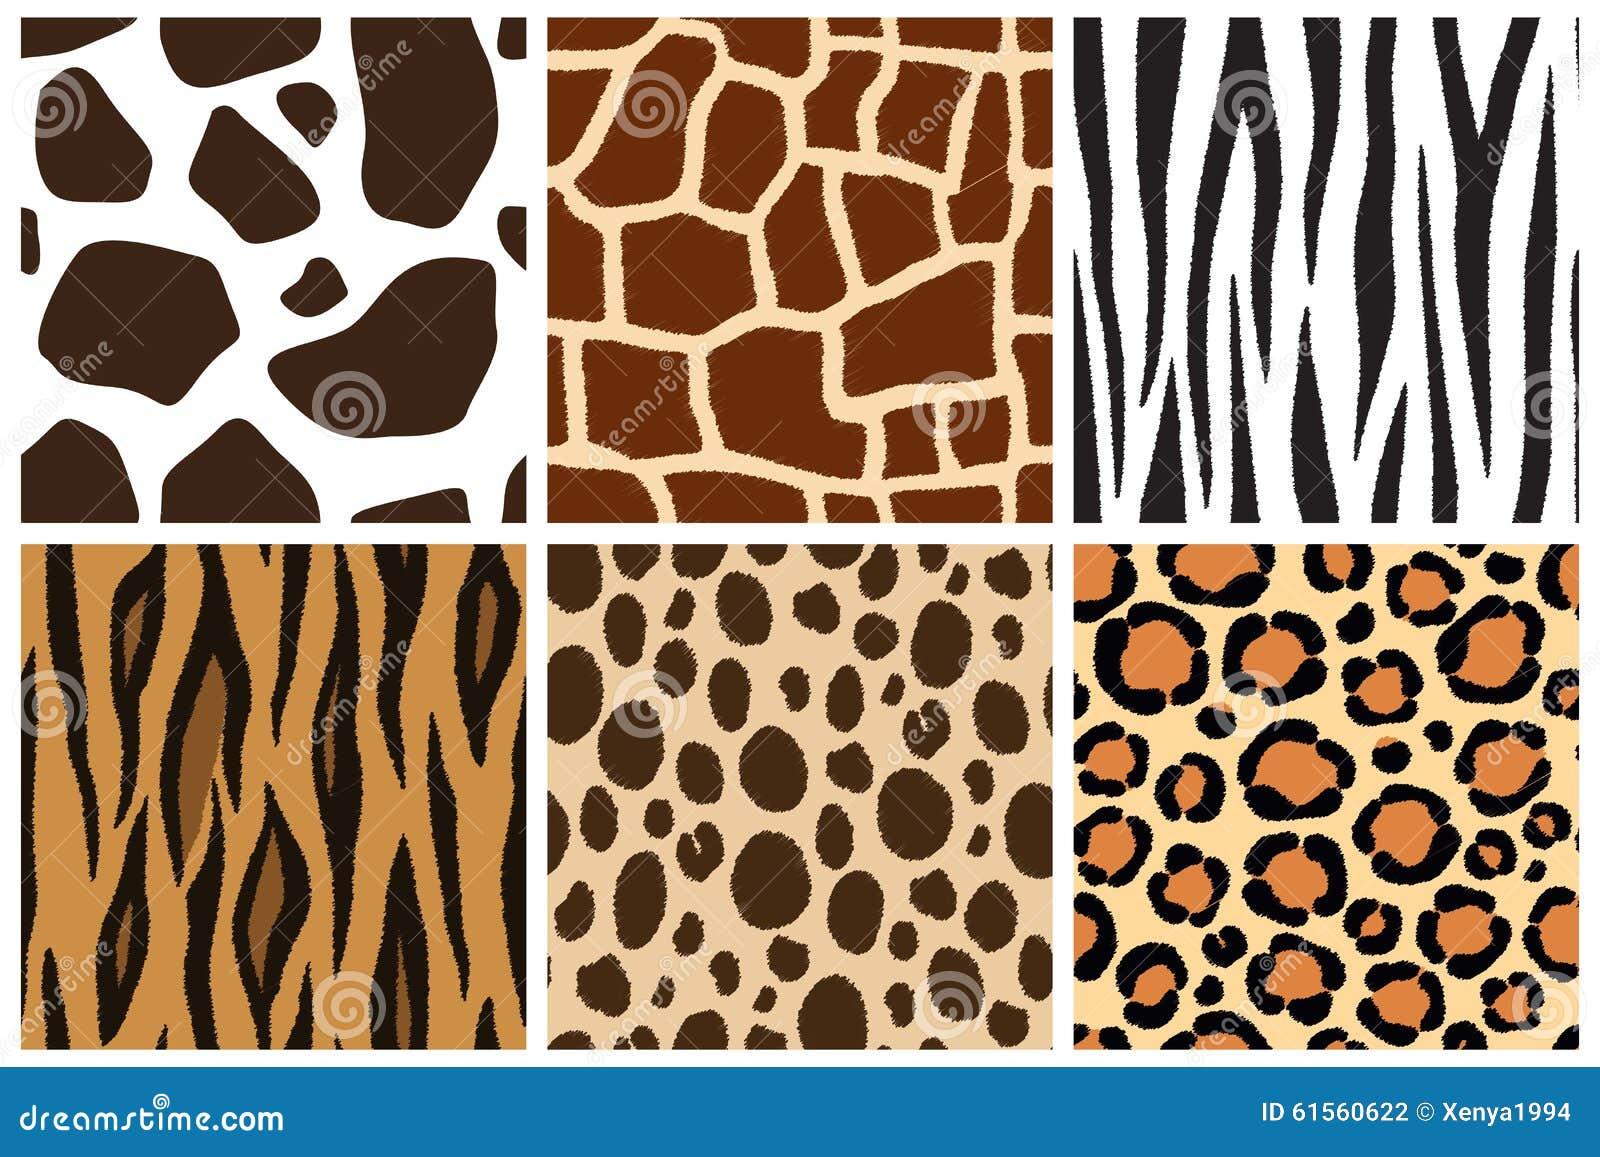 Animal Skin. Seamless Patterns For Design. Cow, Giraffe